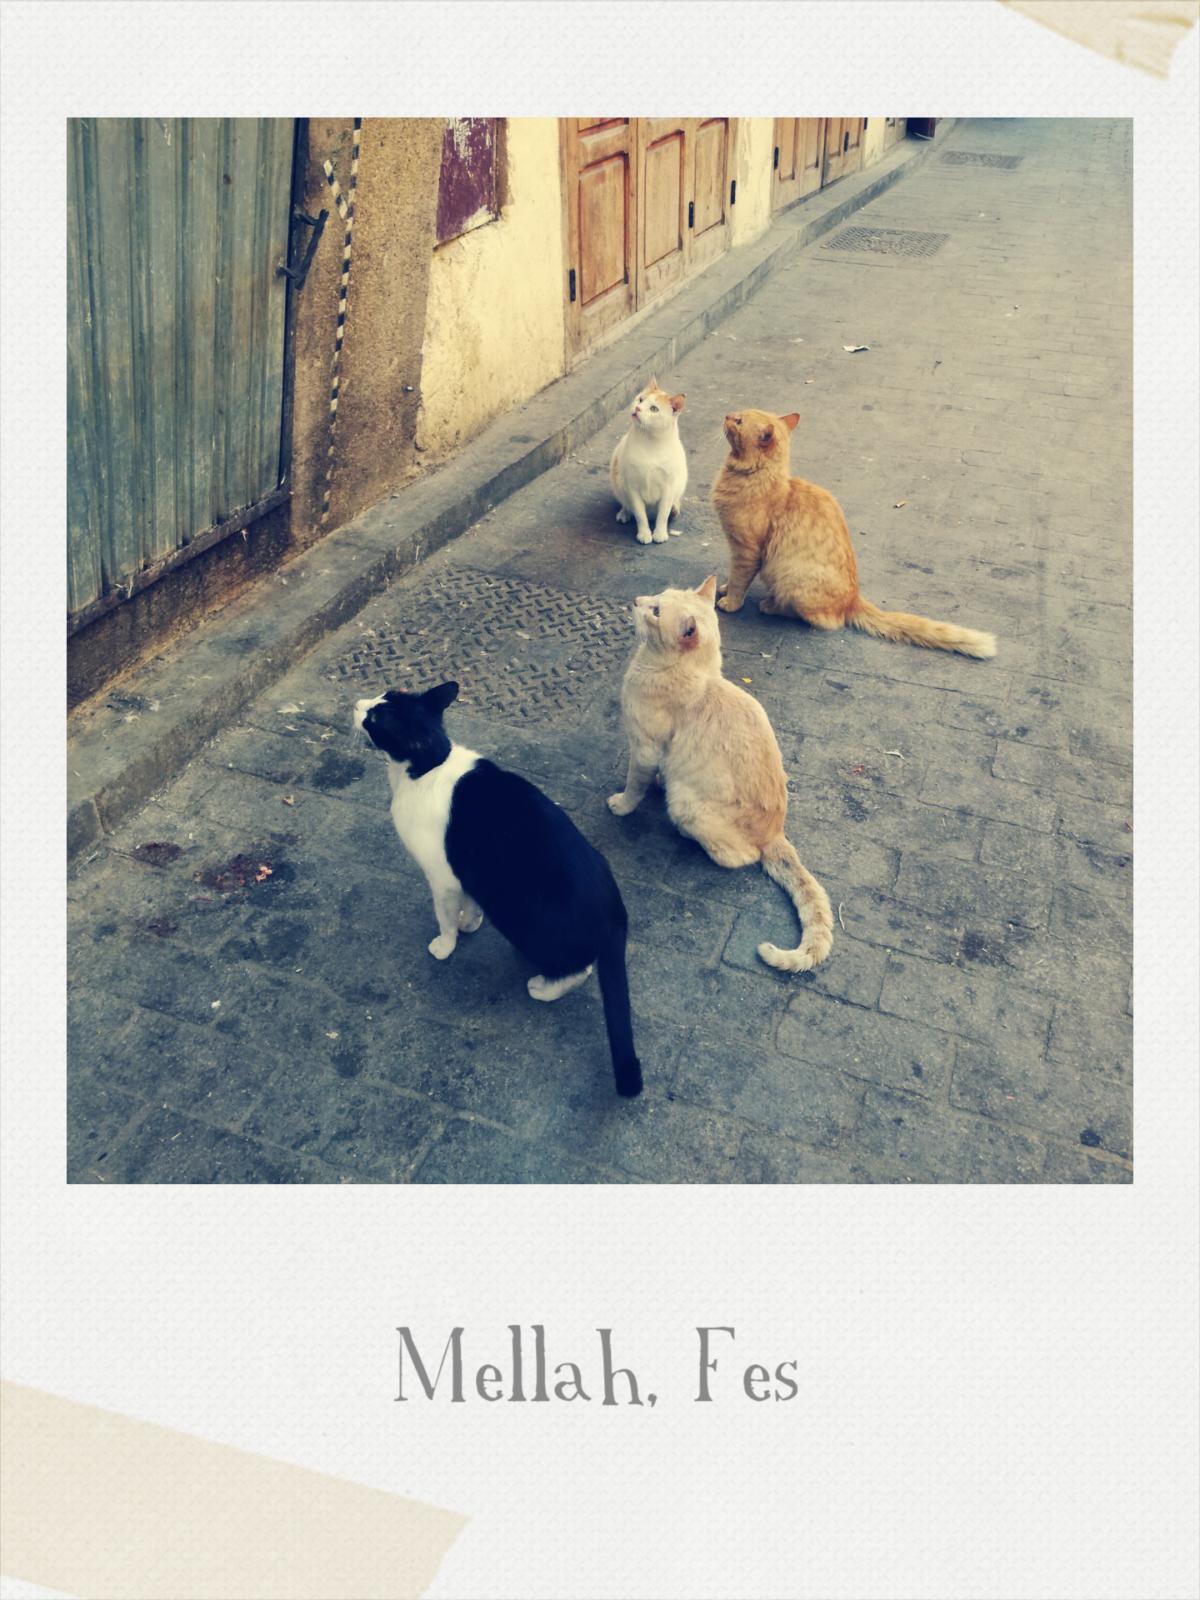 Mellah _ Fes, 22 febbraio